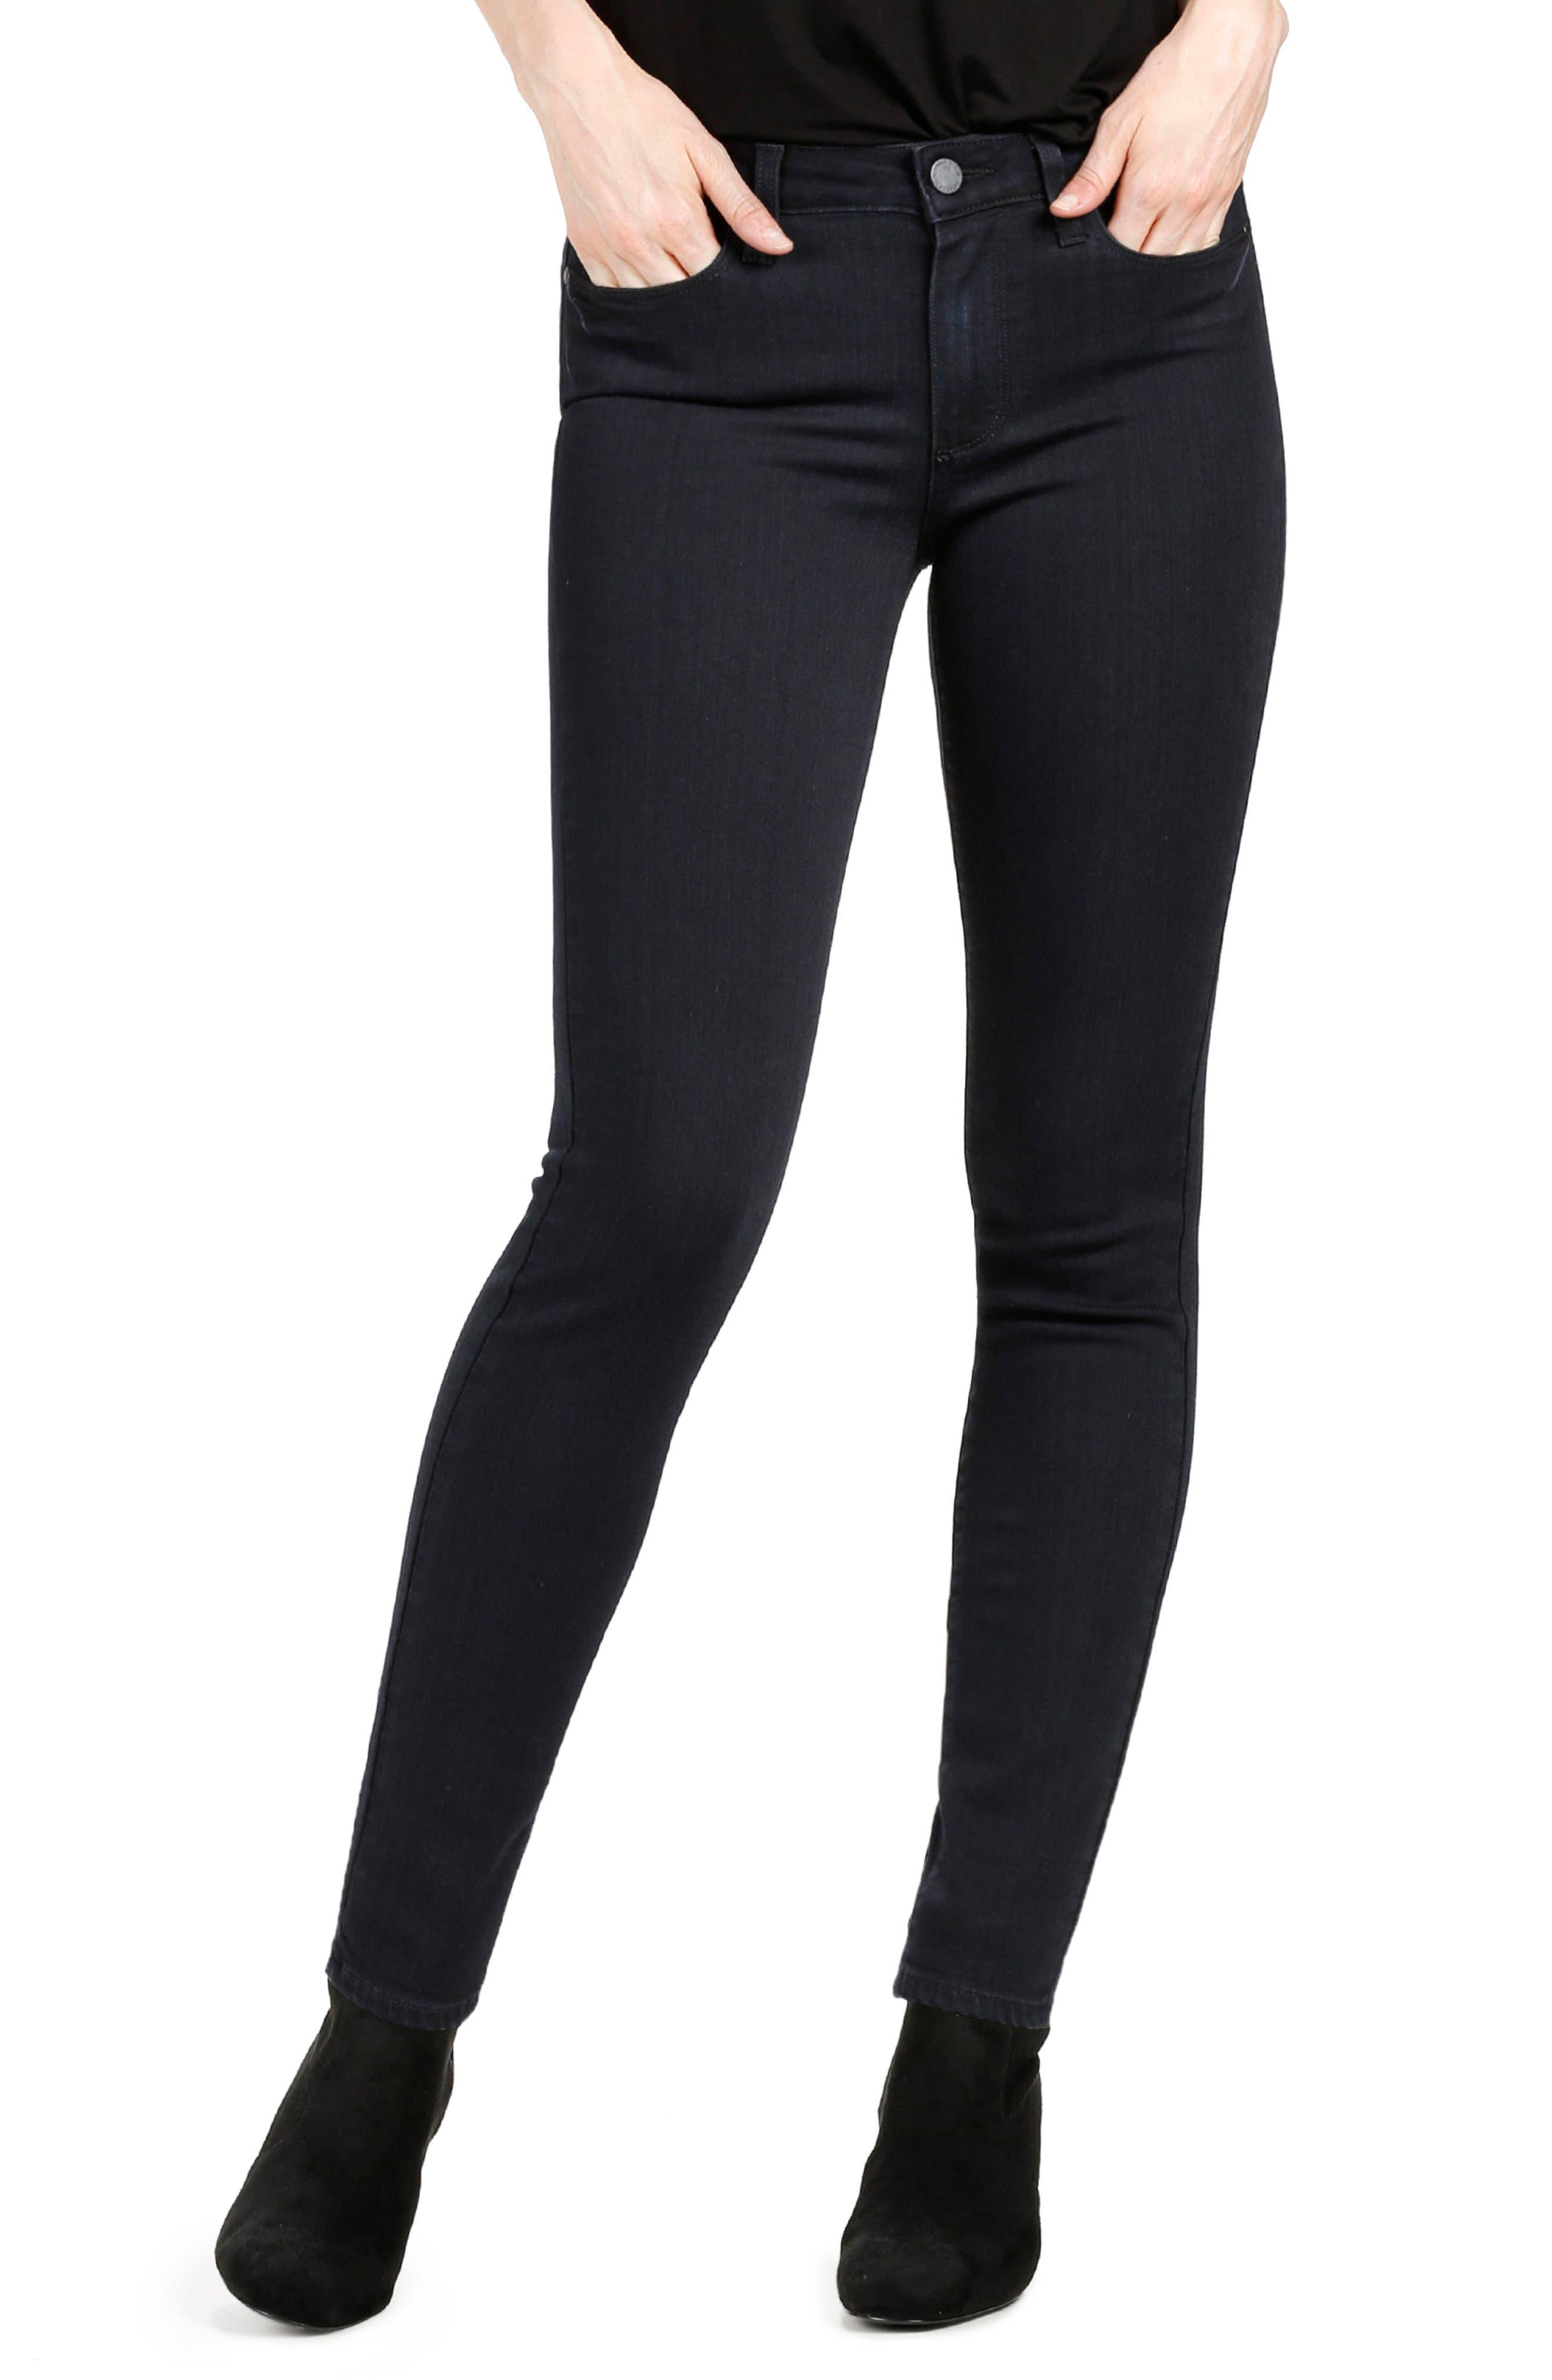 PAIGE Transcend - Verdugo Ultra Skinny Jeans (Cherie)